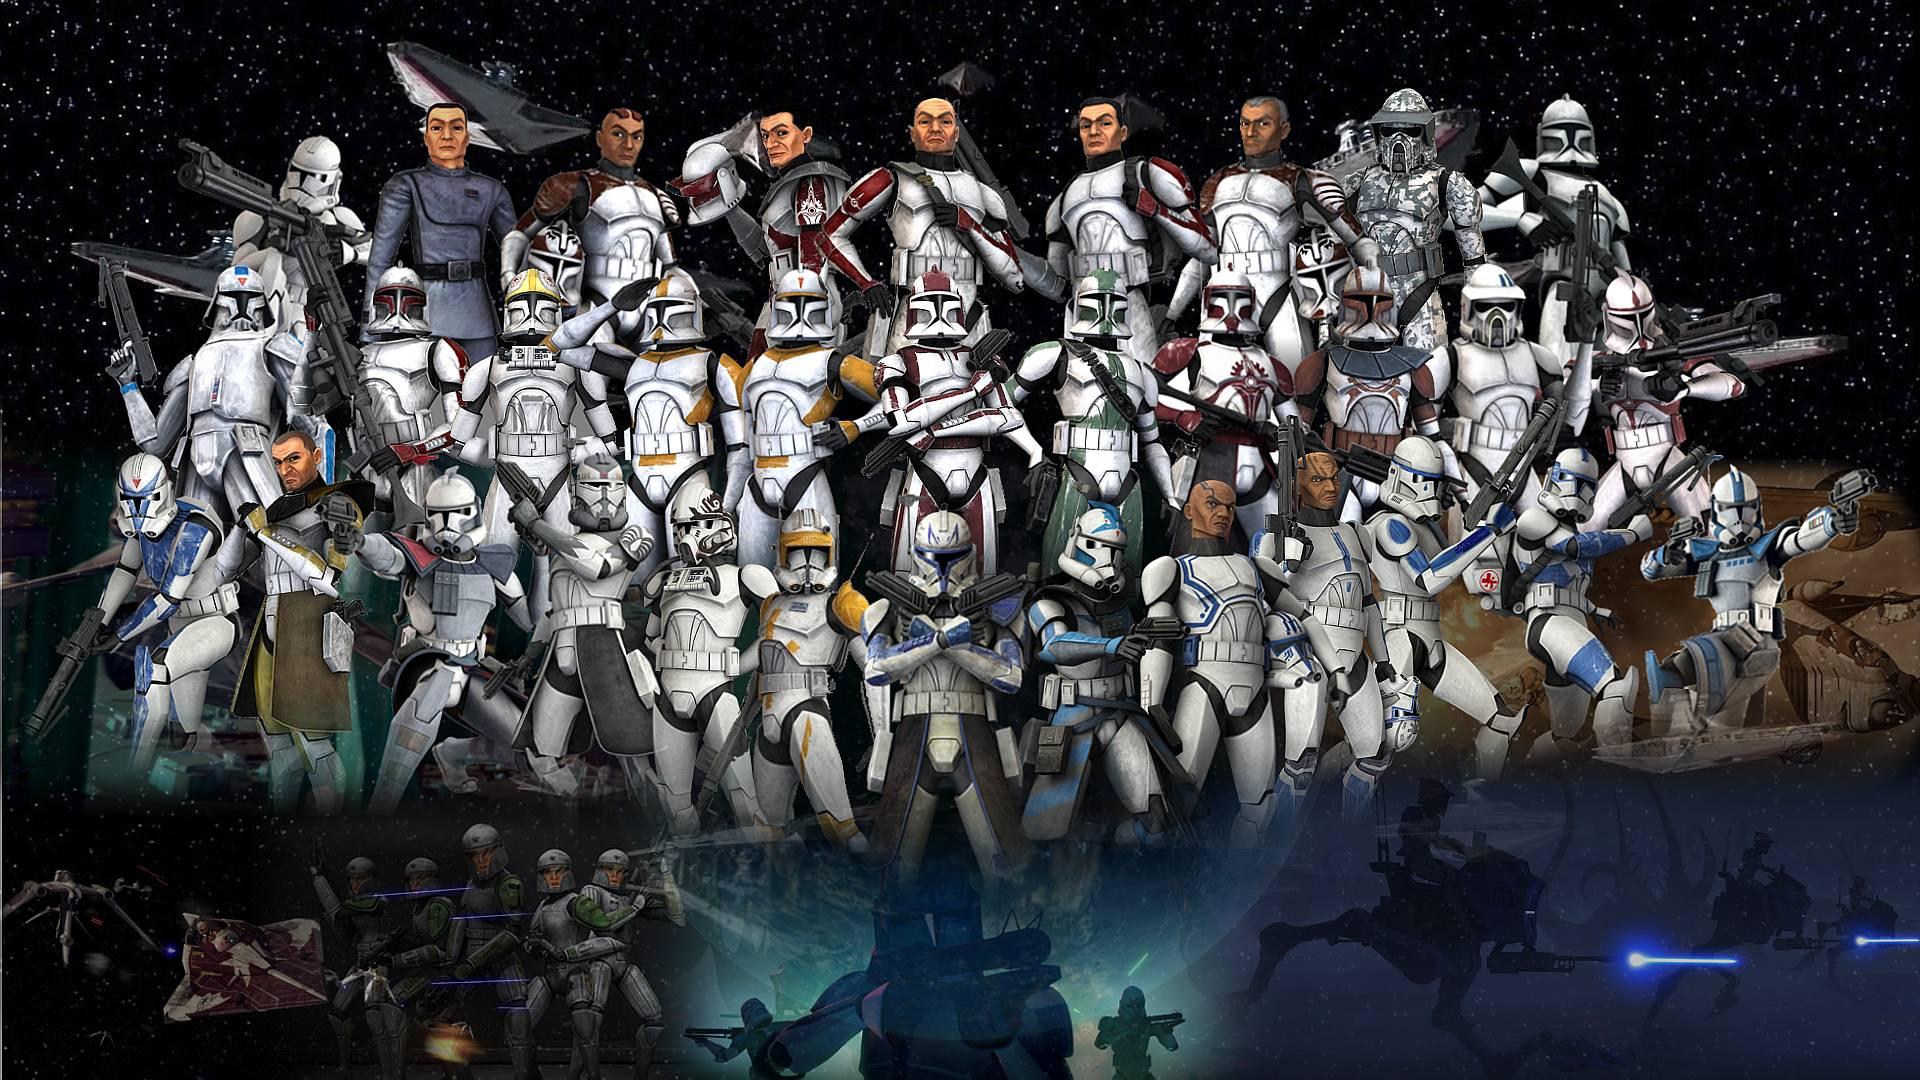 Star Wars Clone Trooper Wallpapers 1920x1080